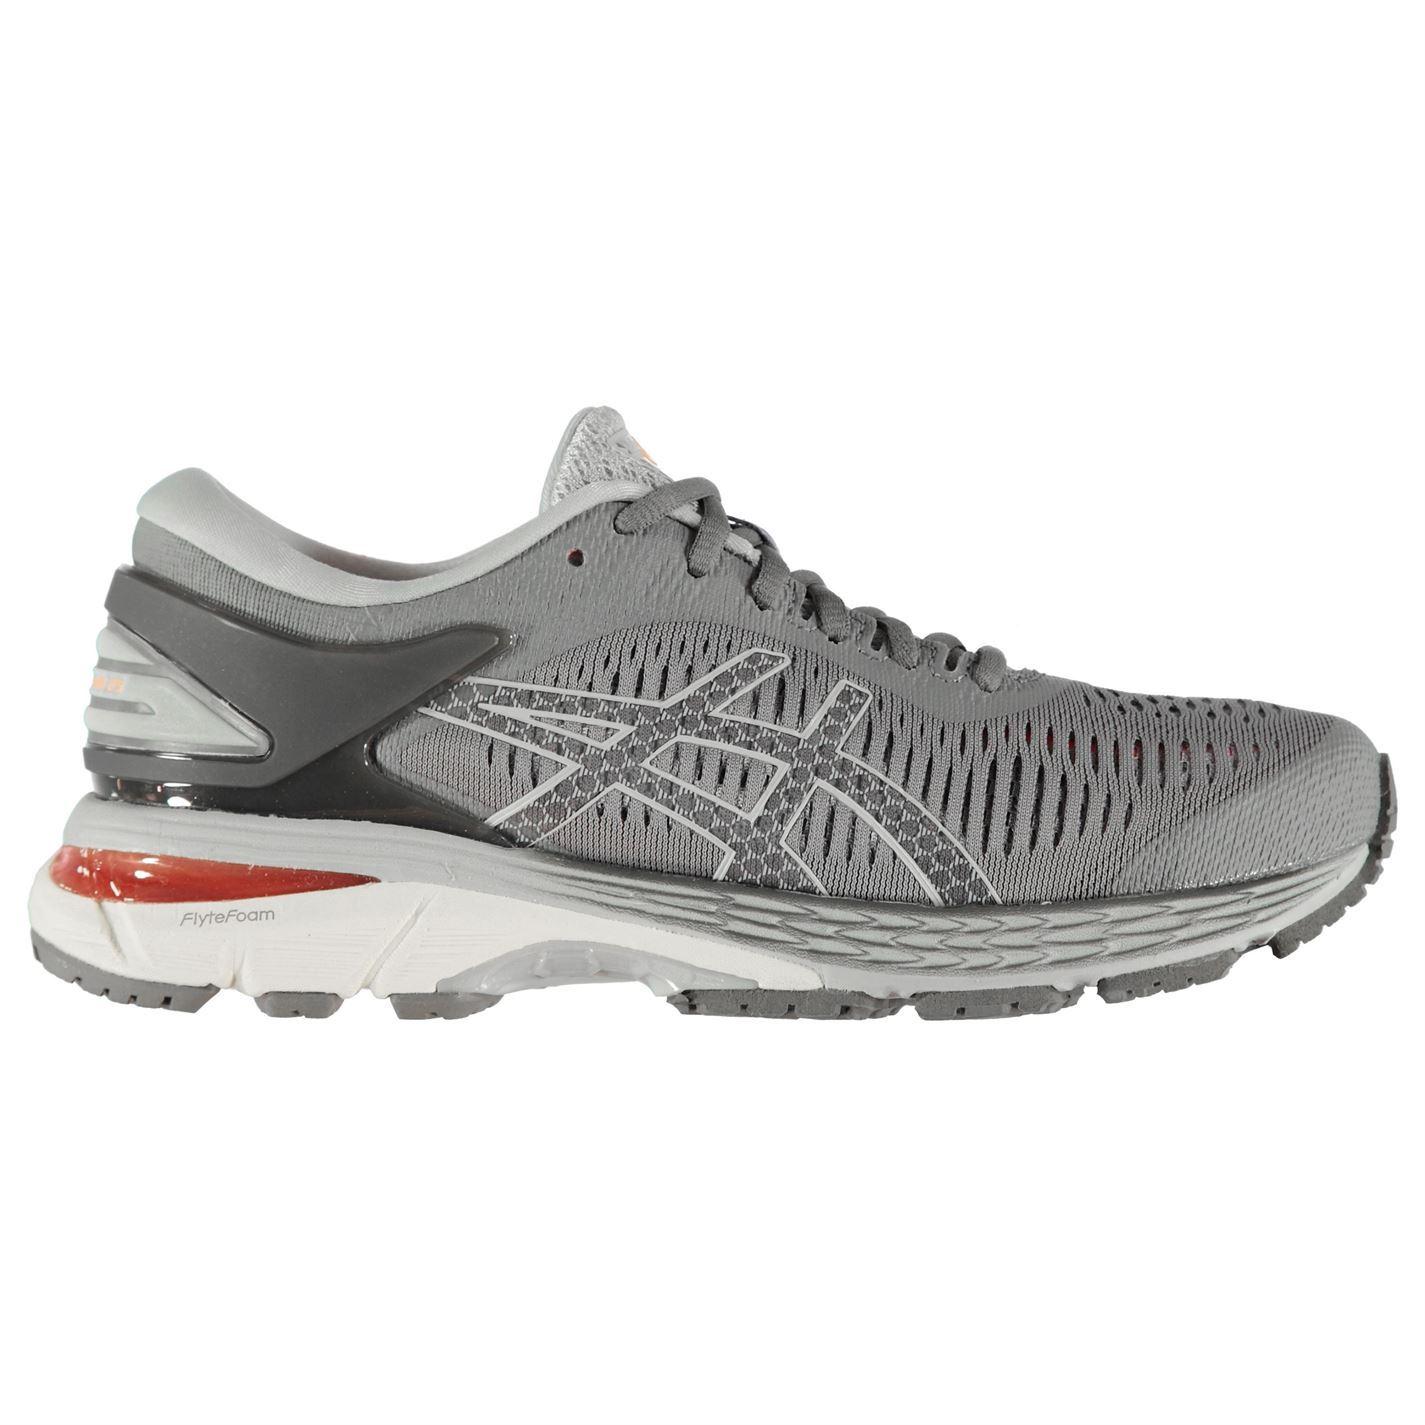 Asics Womens Gel Kayano 25 Running Shoes Road Mesh Upper Platform  85b8d29800d0f